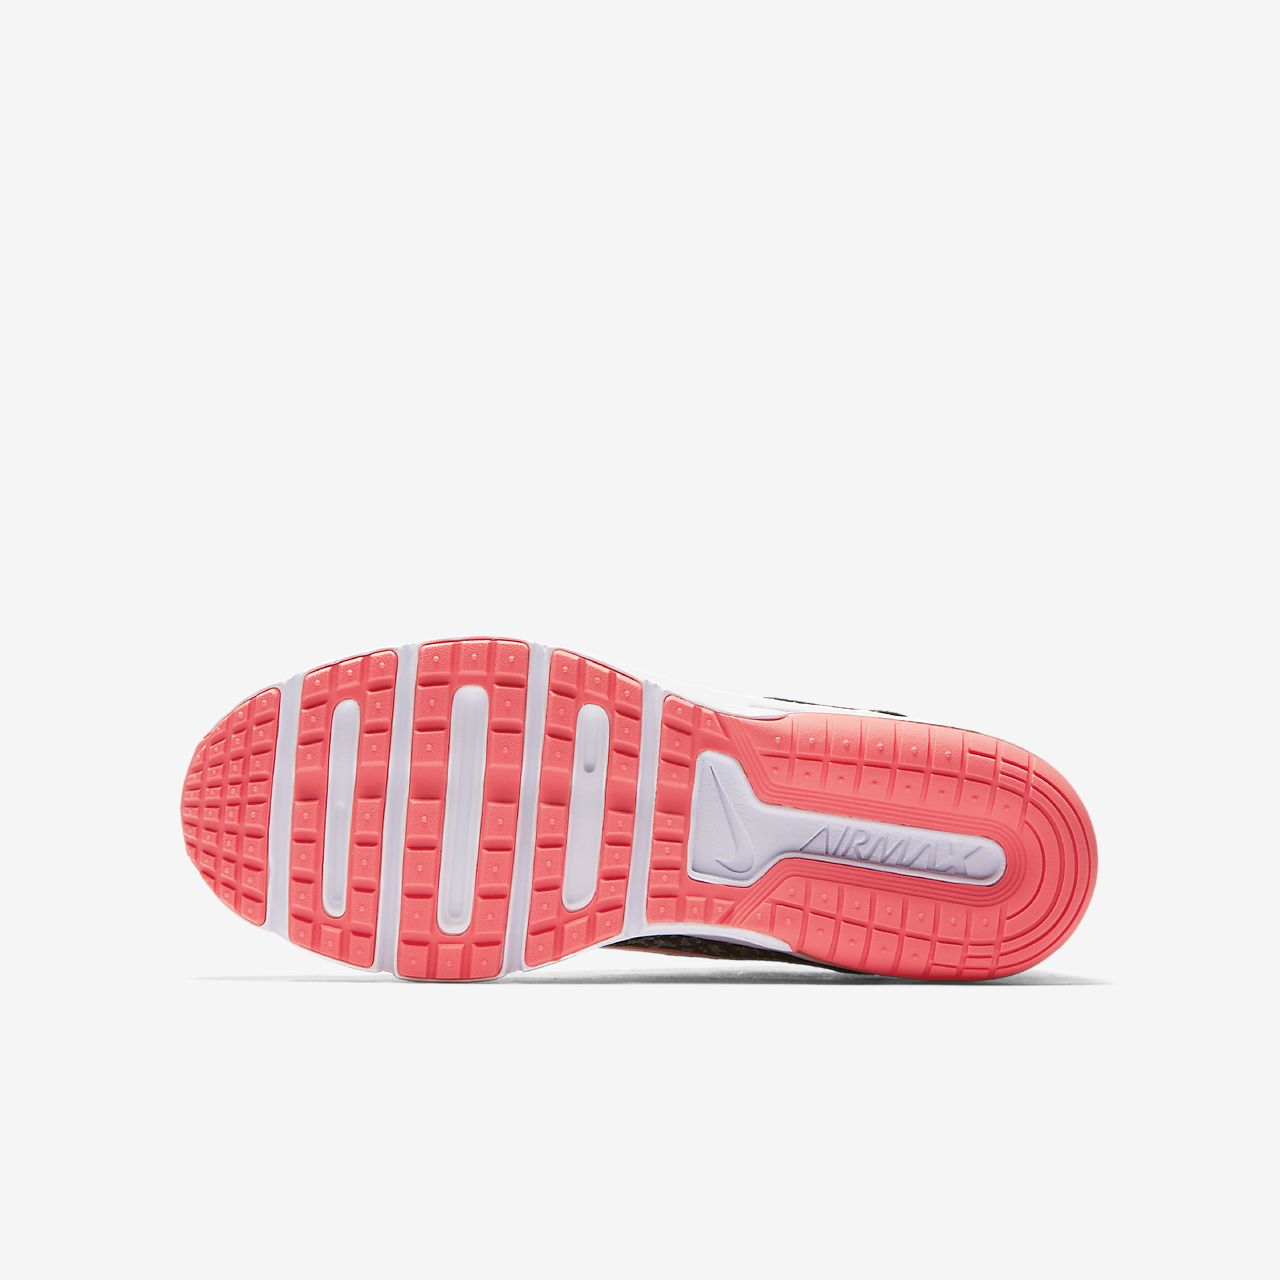 f667fc25e0 Nike Air Max Sequent 2 Older Kids' Running Shoe. Nike.com AU